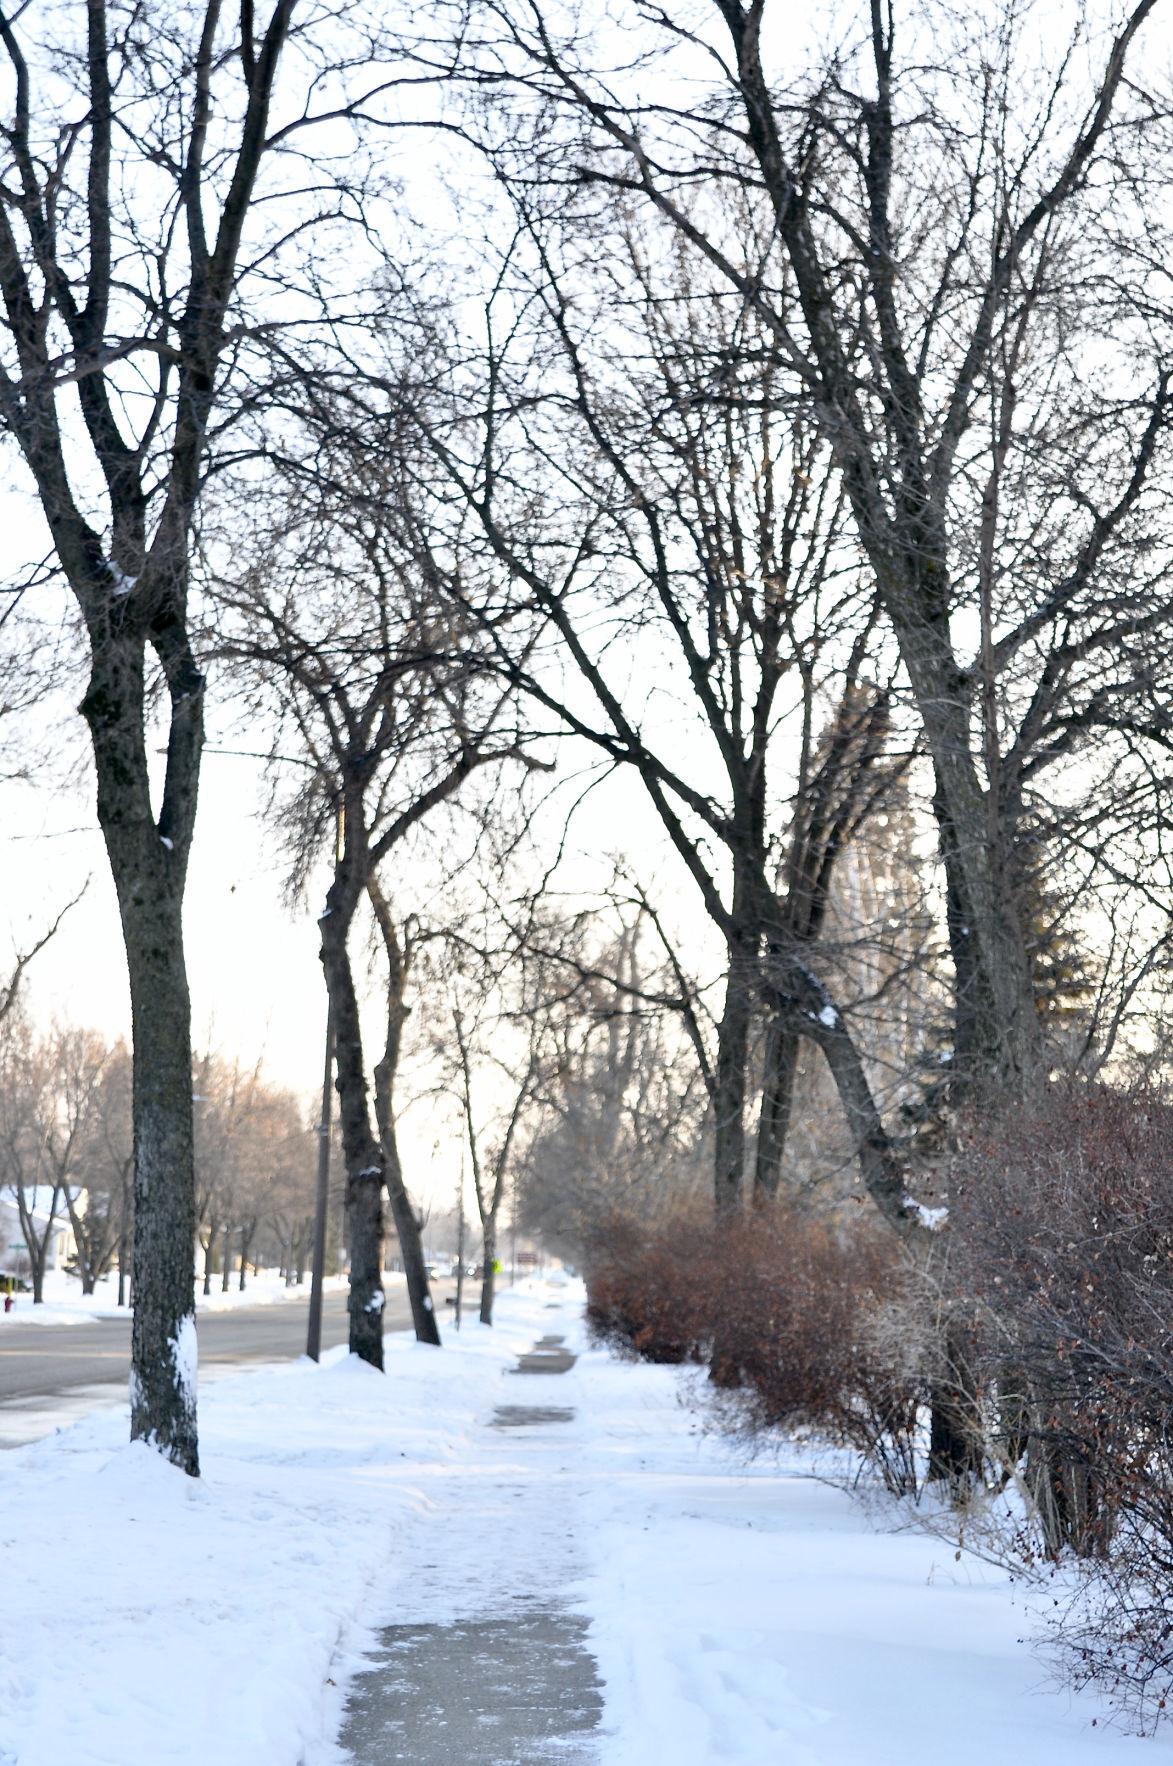 Sibley Avenue trail grant application